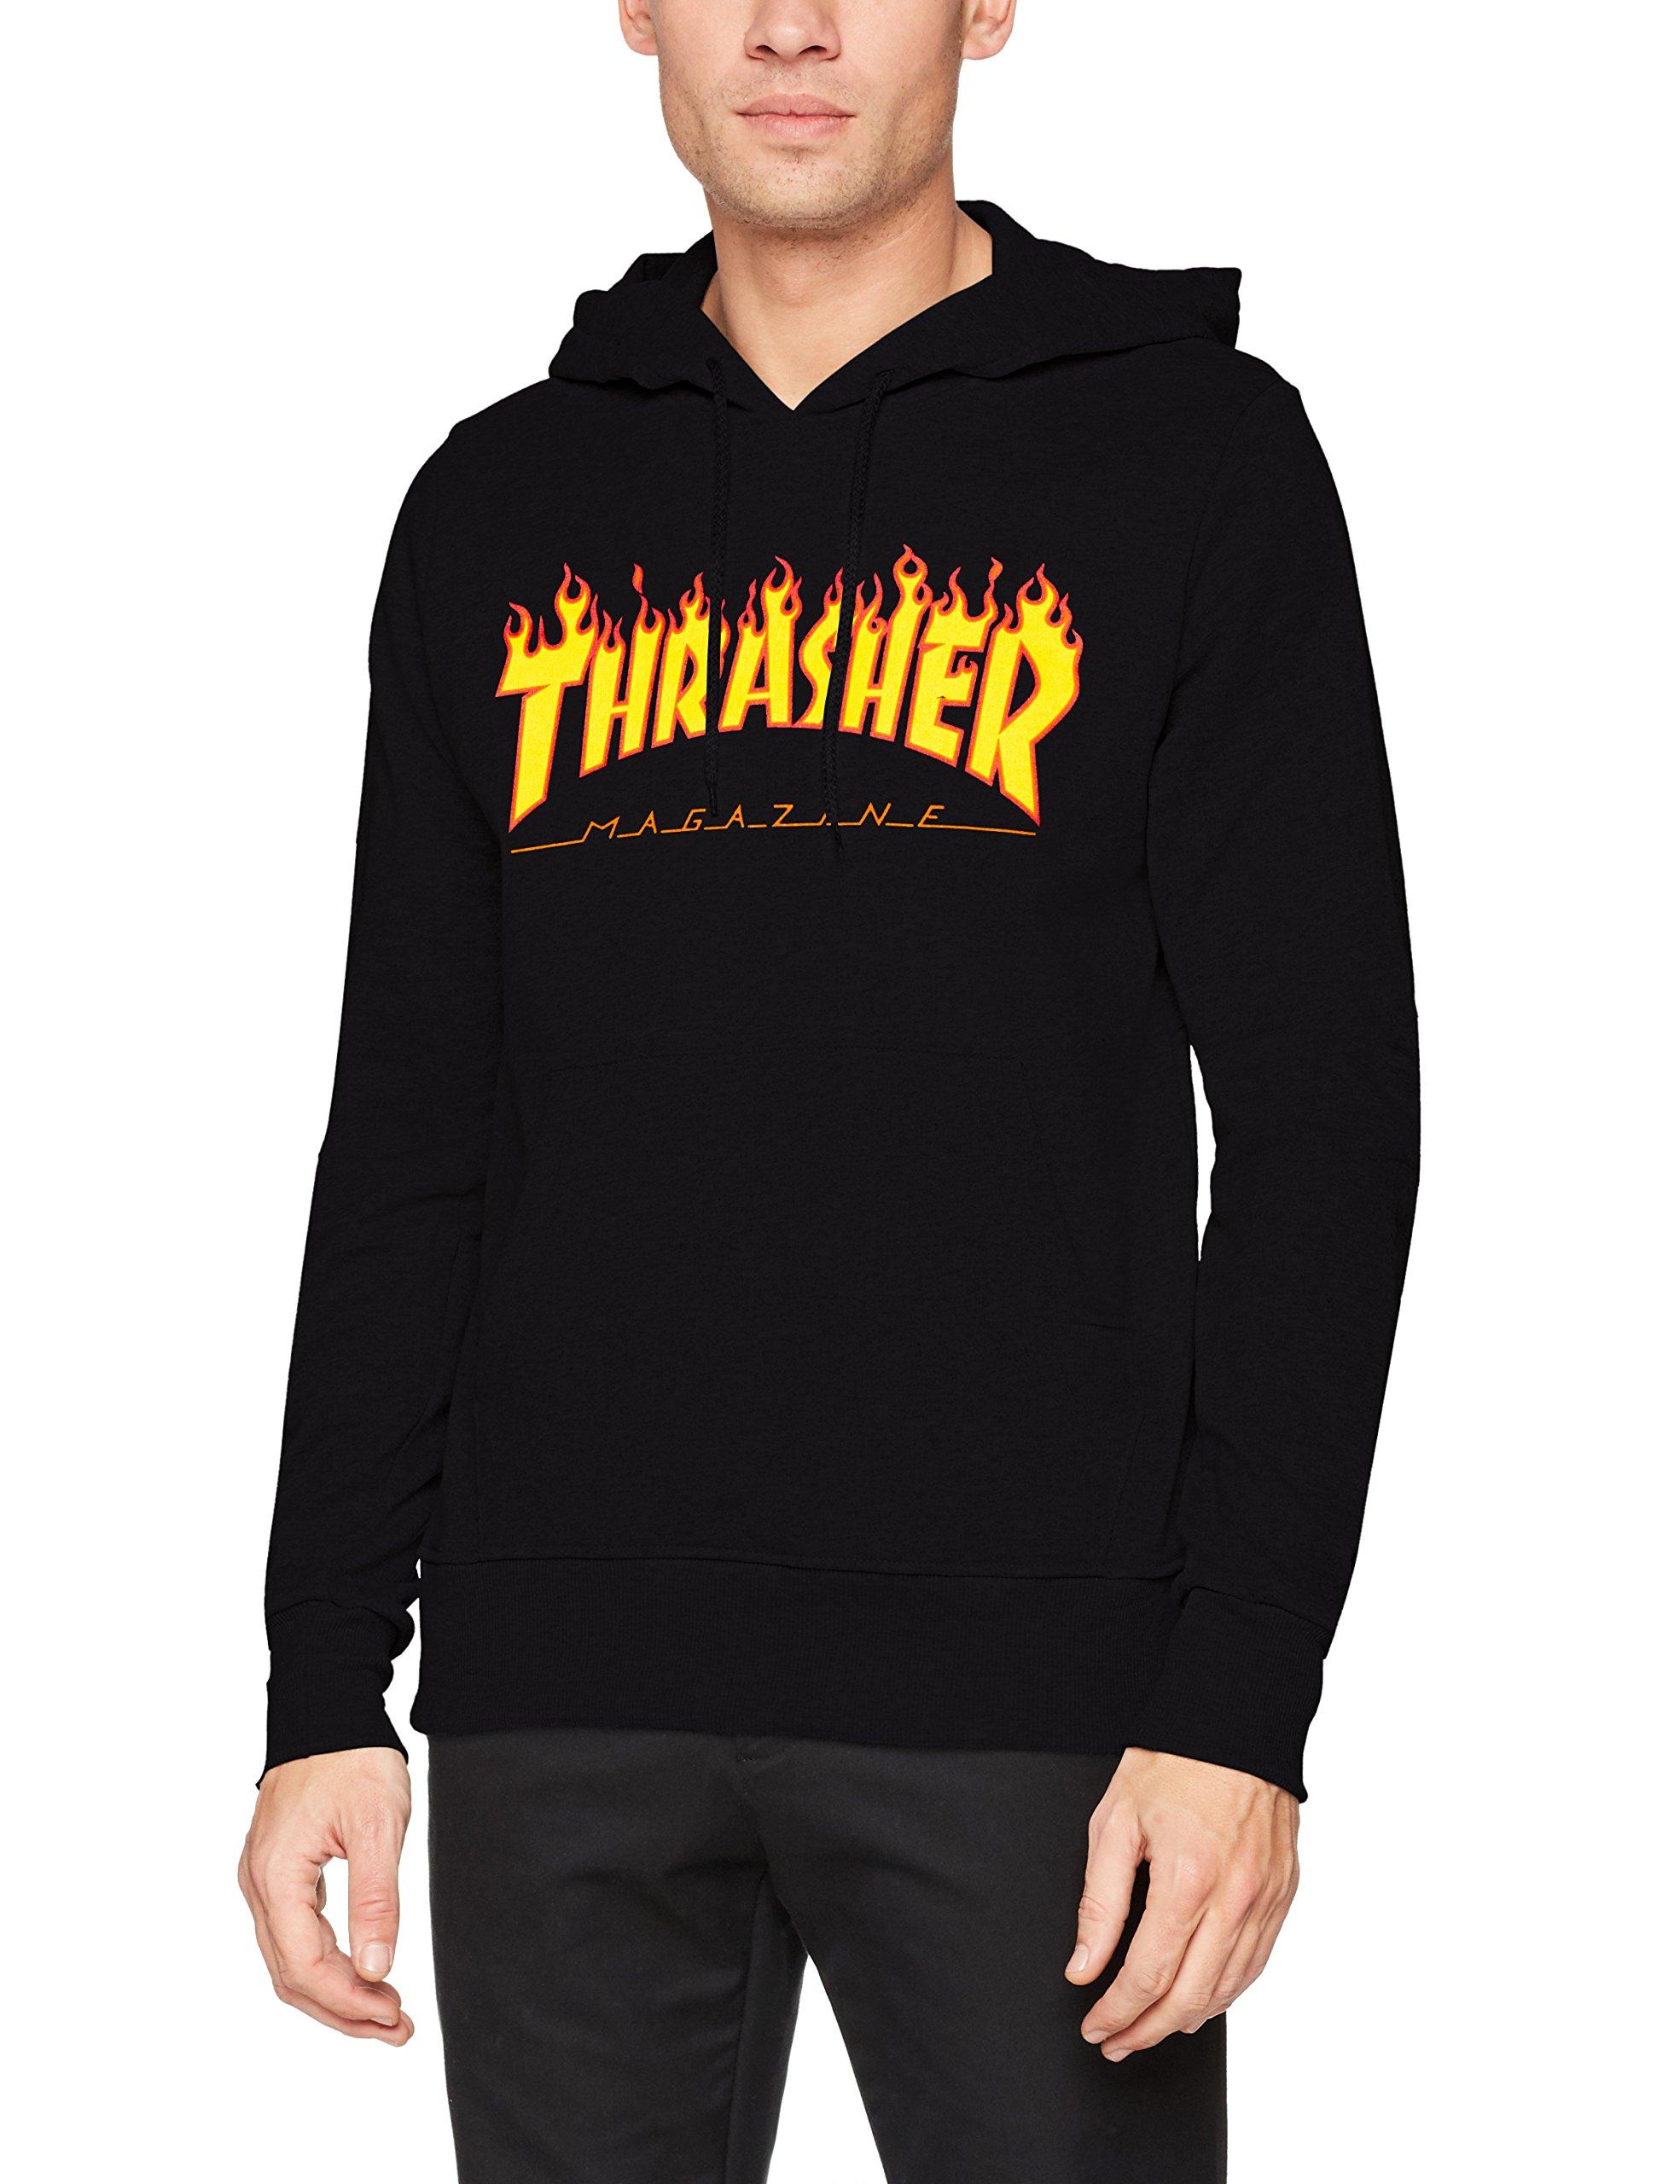 Thrasher Flame Logo Hooded Sweatshirt (Black) Small